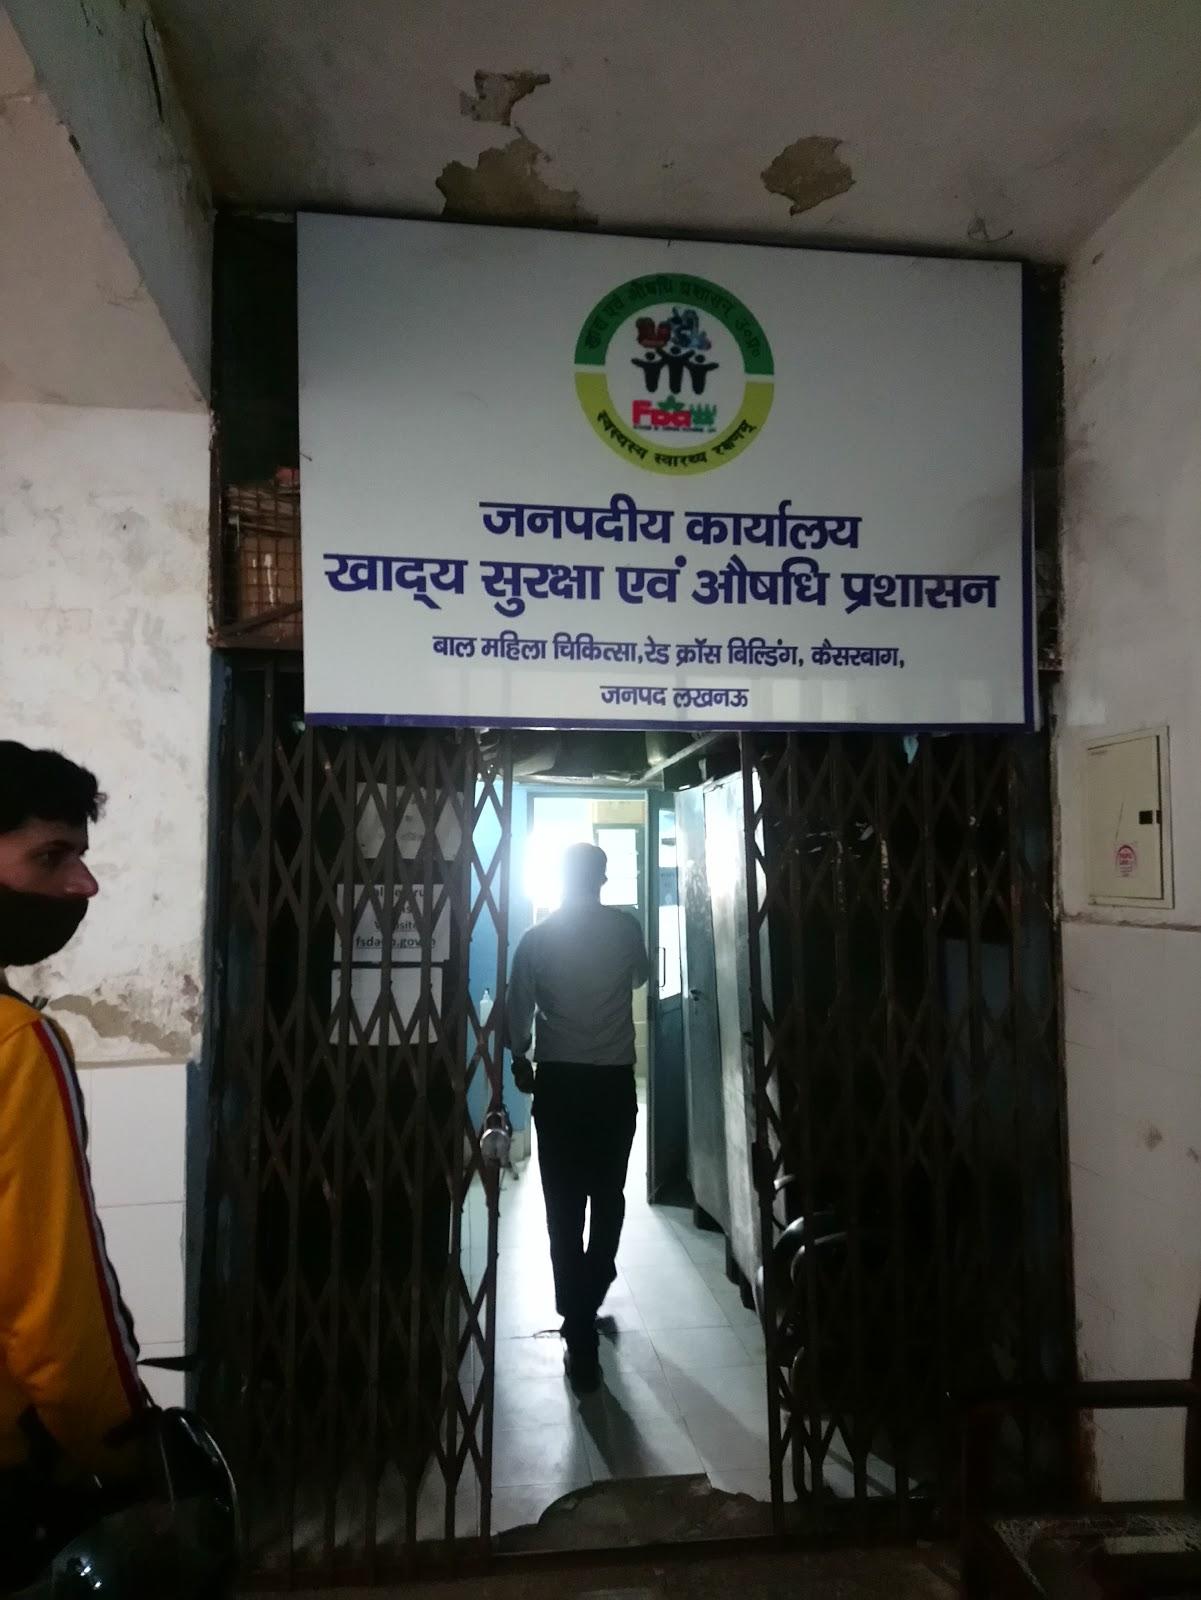 blood bank Indian Red Cross Society near Lucknow Uttar Pradesh